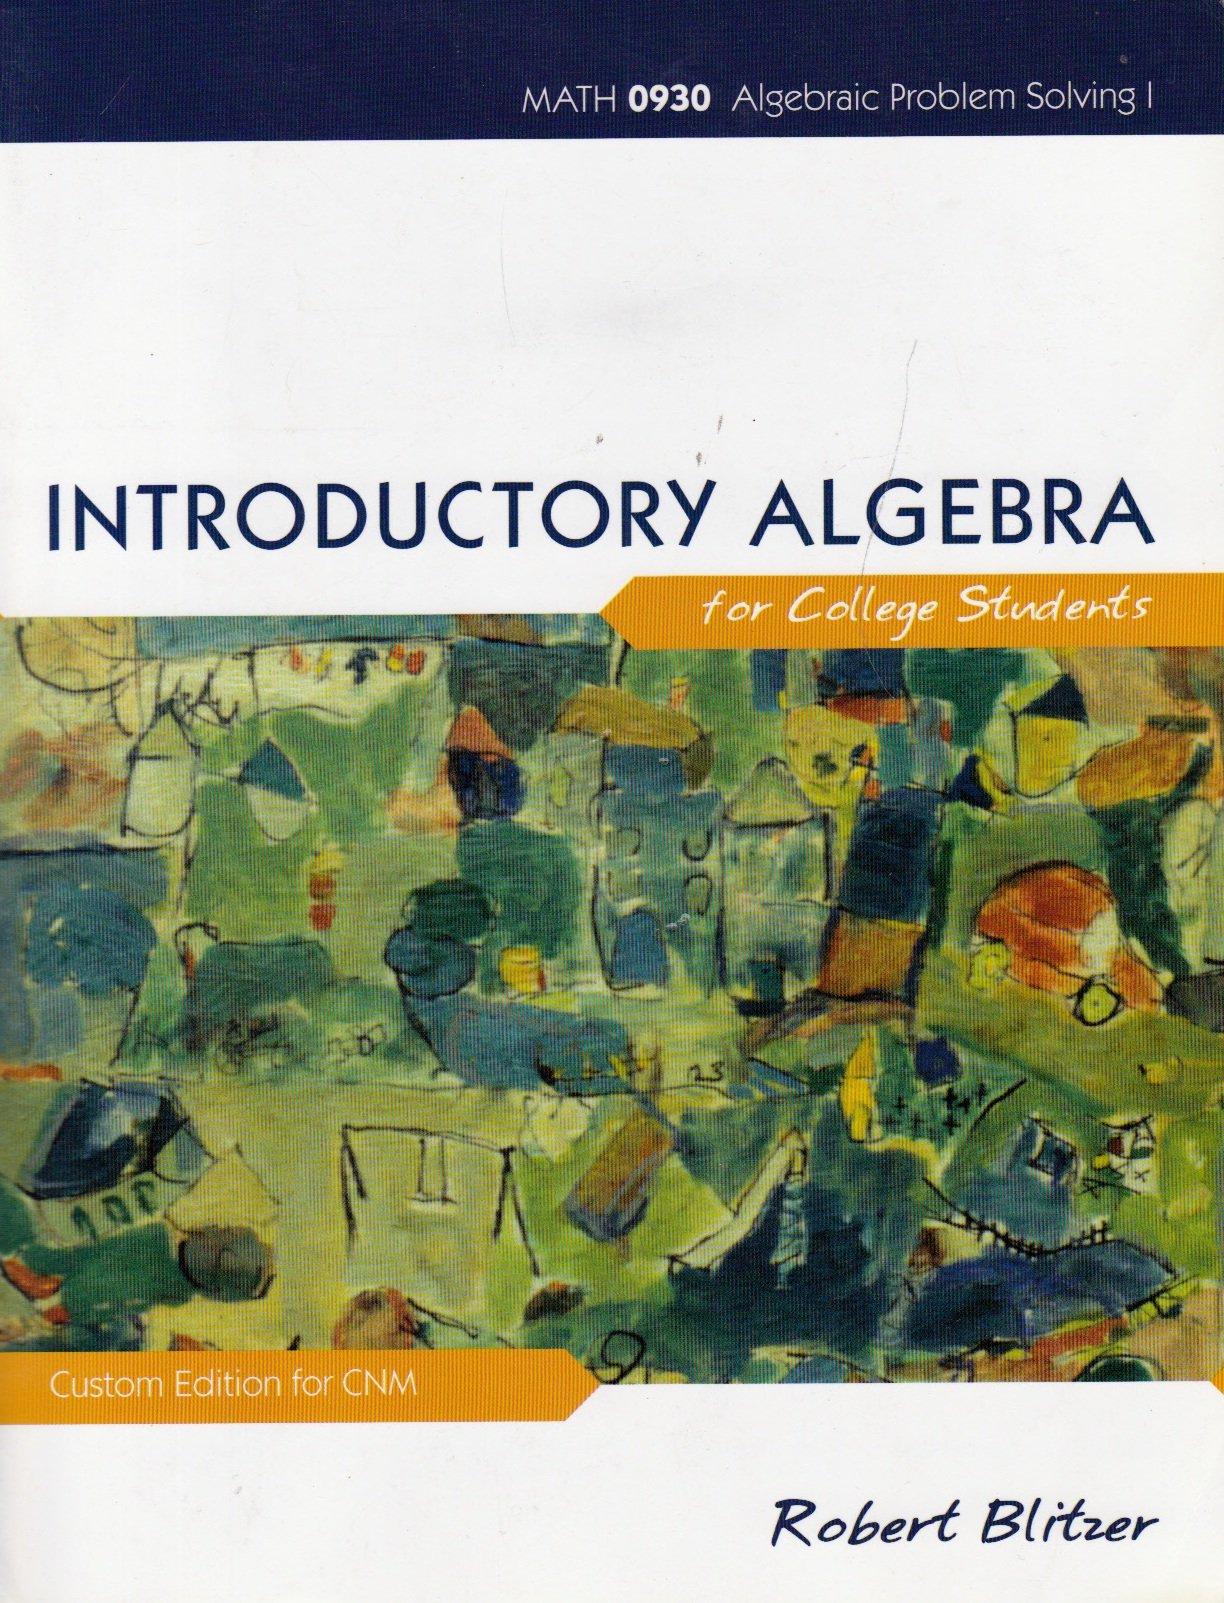 Download Introductory Algebra for College Students (Math 0930 Algebraic Problem Solving I - Custom Edition for CNM) pdf